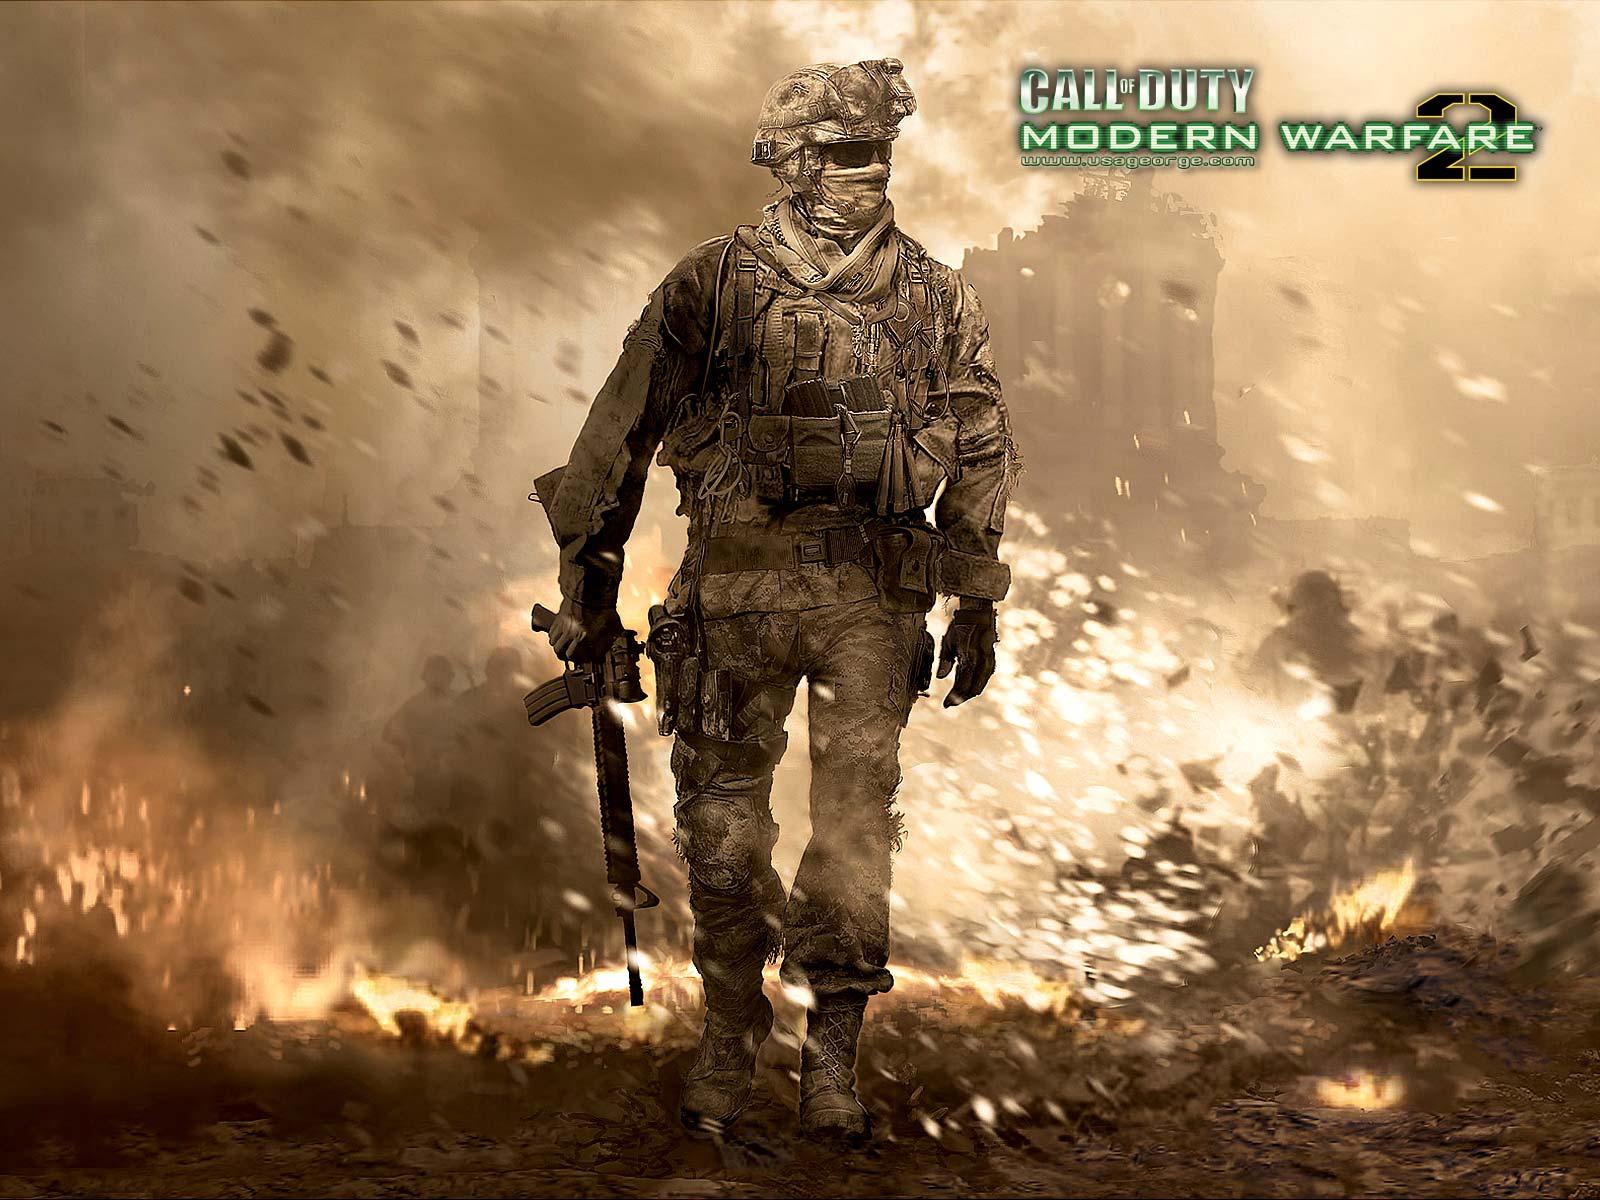 Call of Duty: Modern Warfare 3 - GameSpot